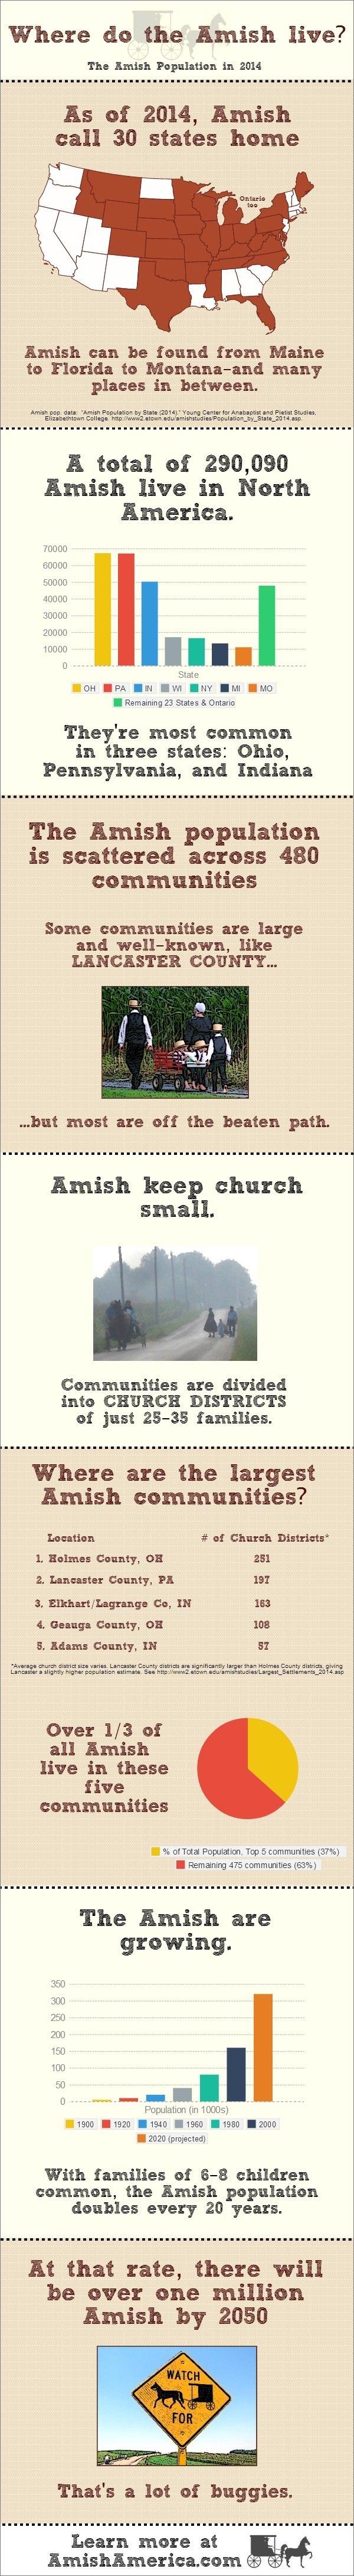 Amish Population 2014 Infographic